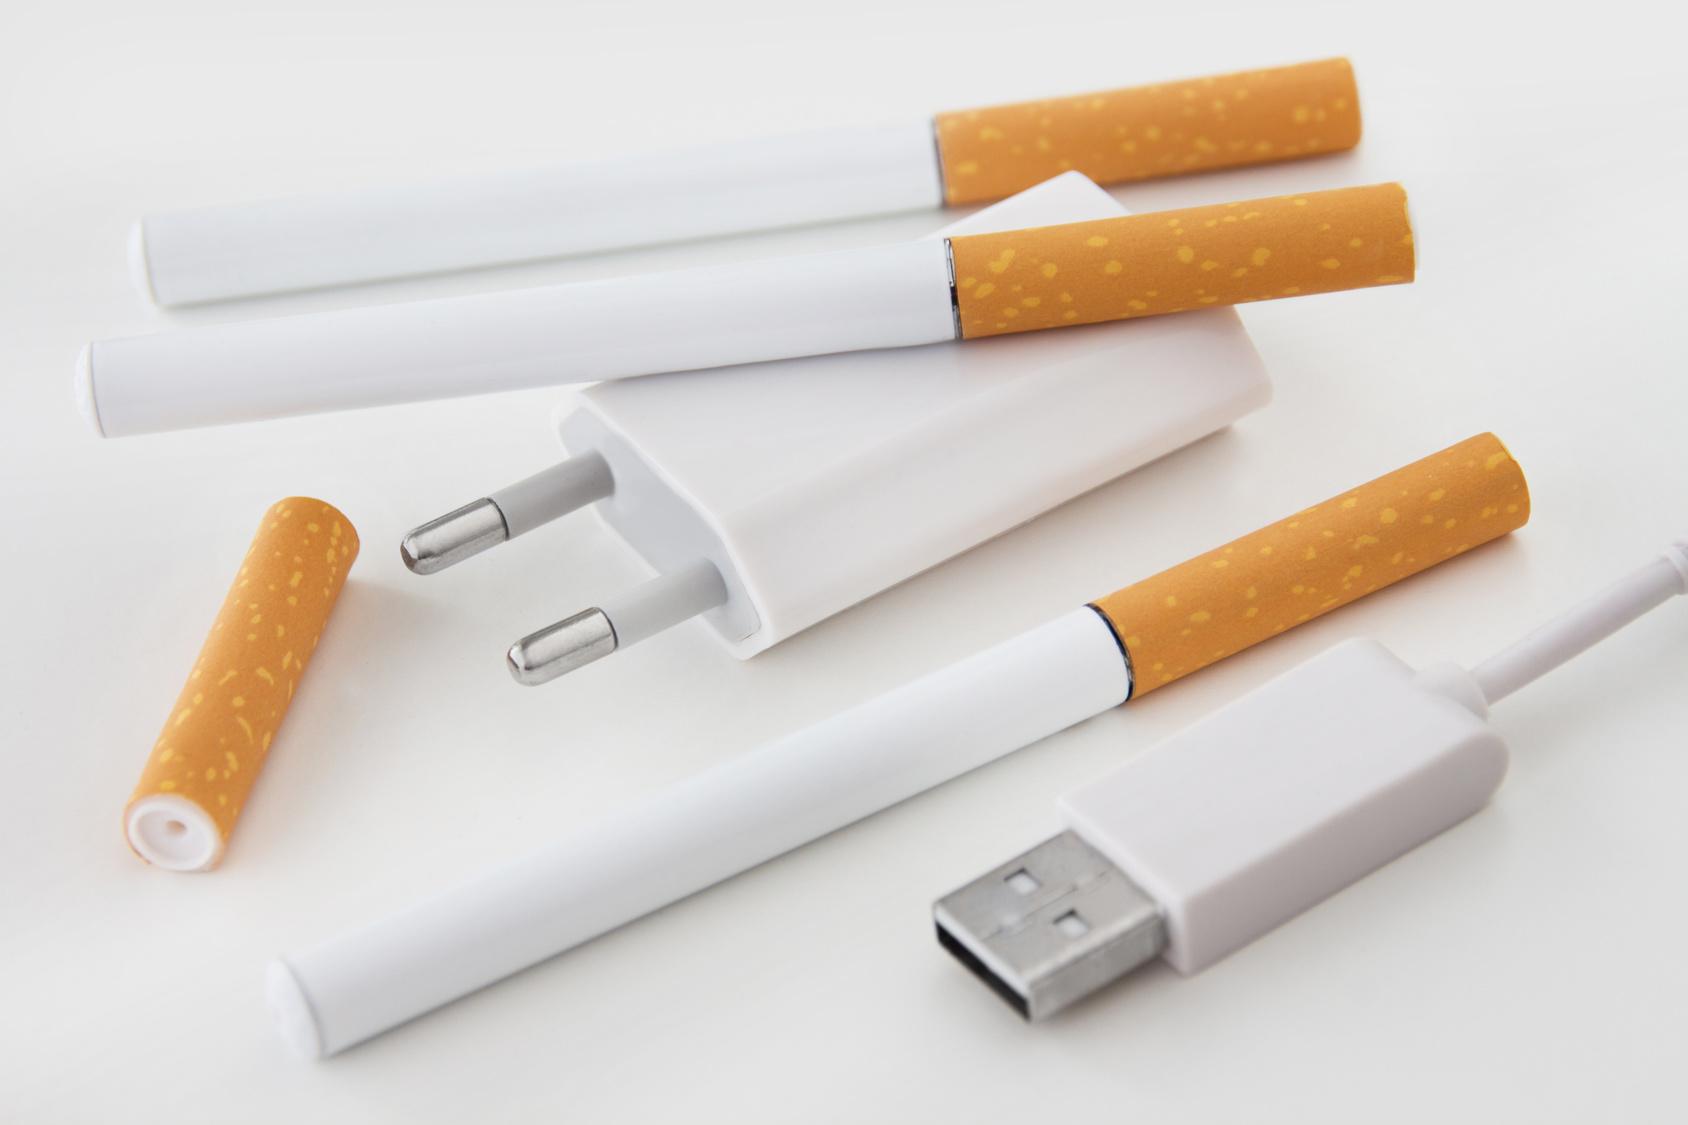 e zigaretten verdampfer liquids richtig entsorgen so geht 39 s innocigs. Black Bedroom Furniture Sets. Home Design Ideas